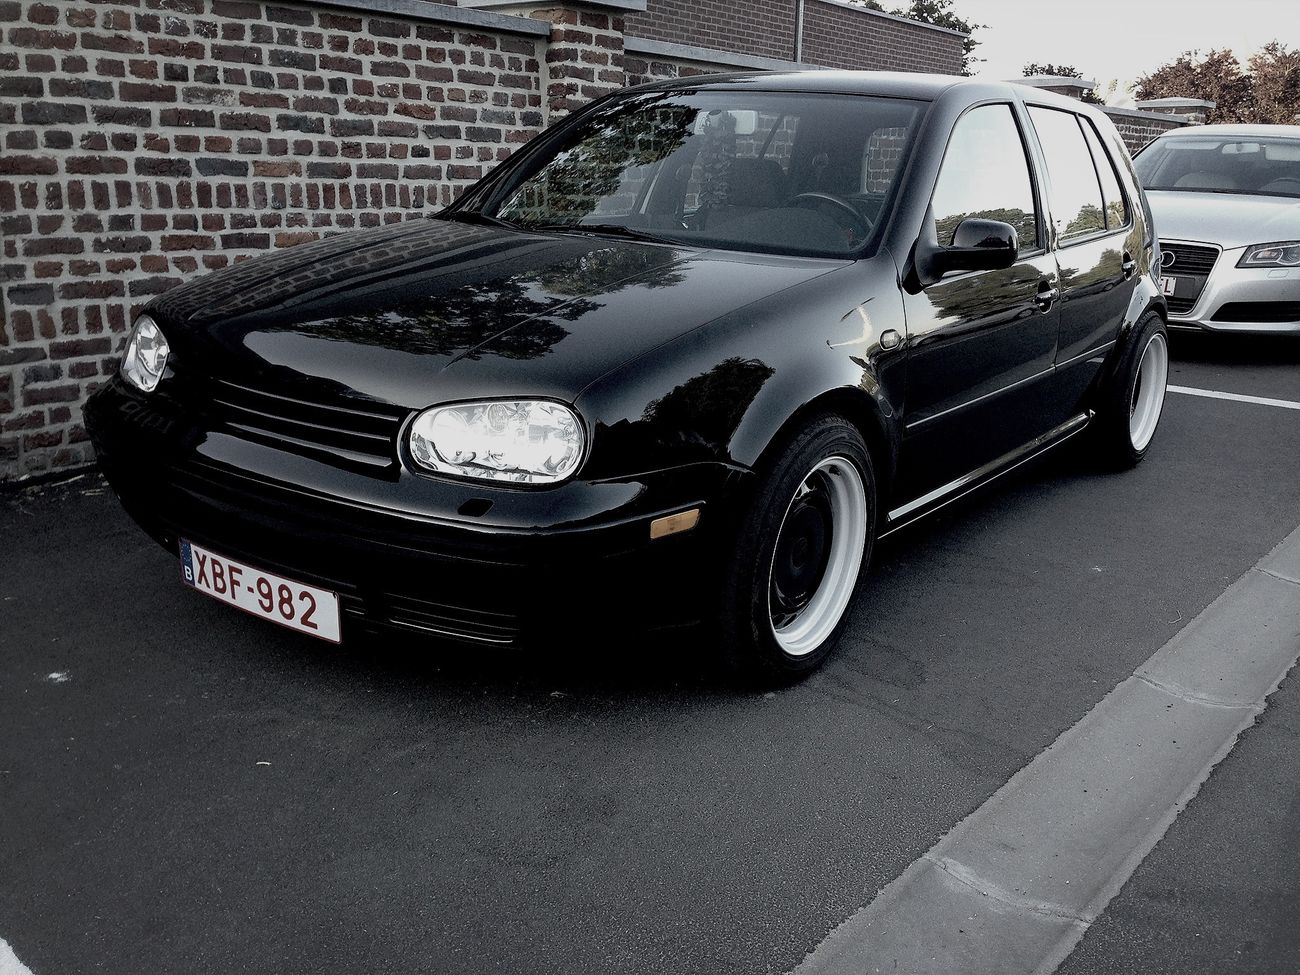 VW Golf Mk IV